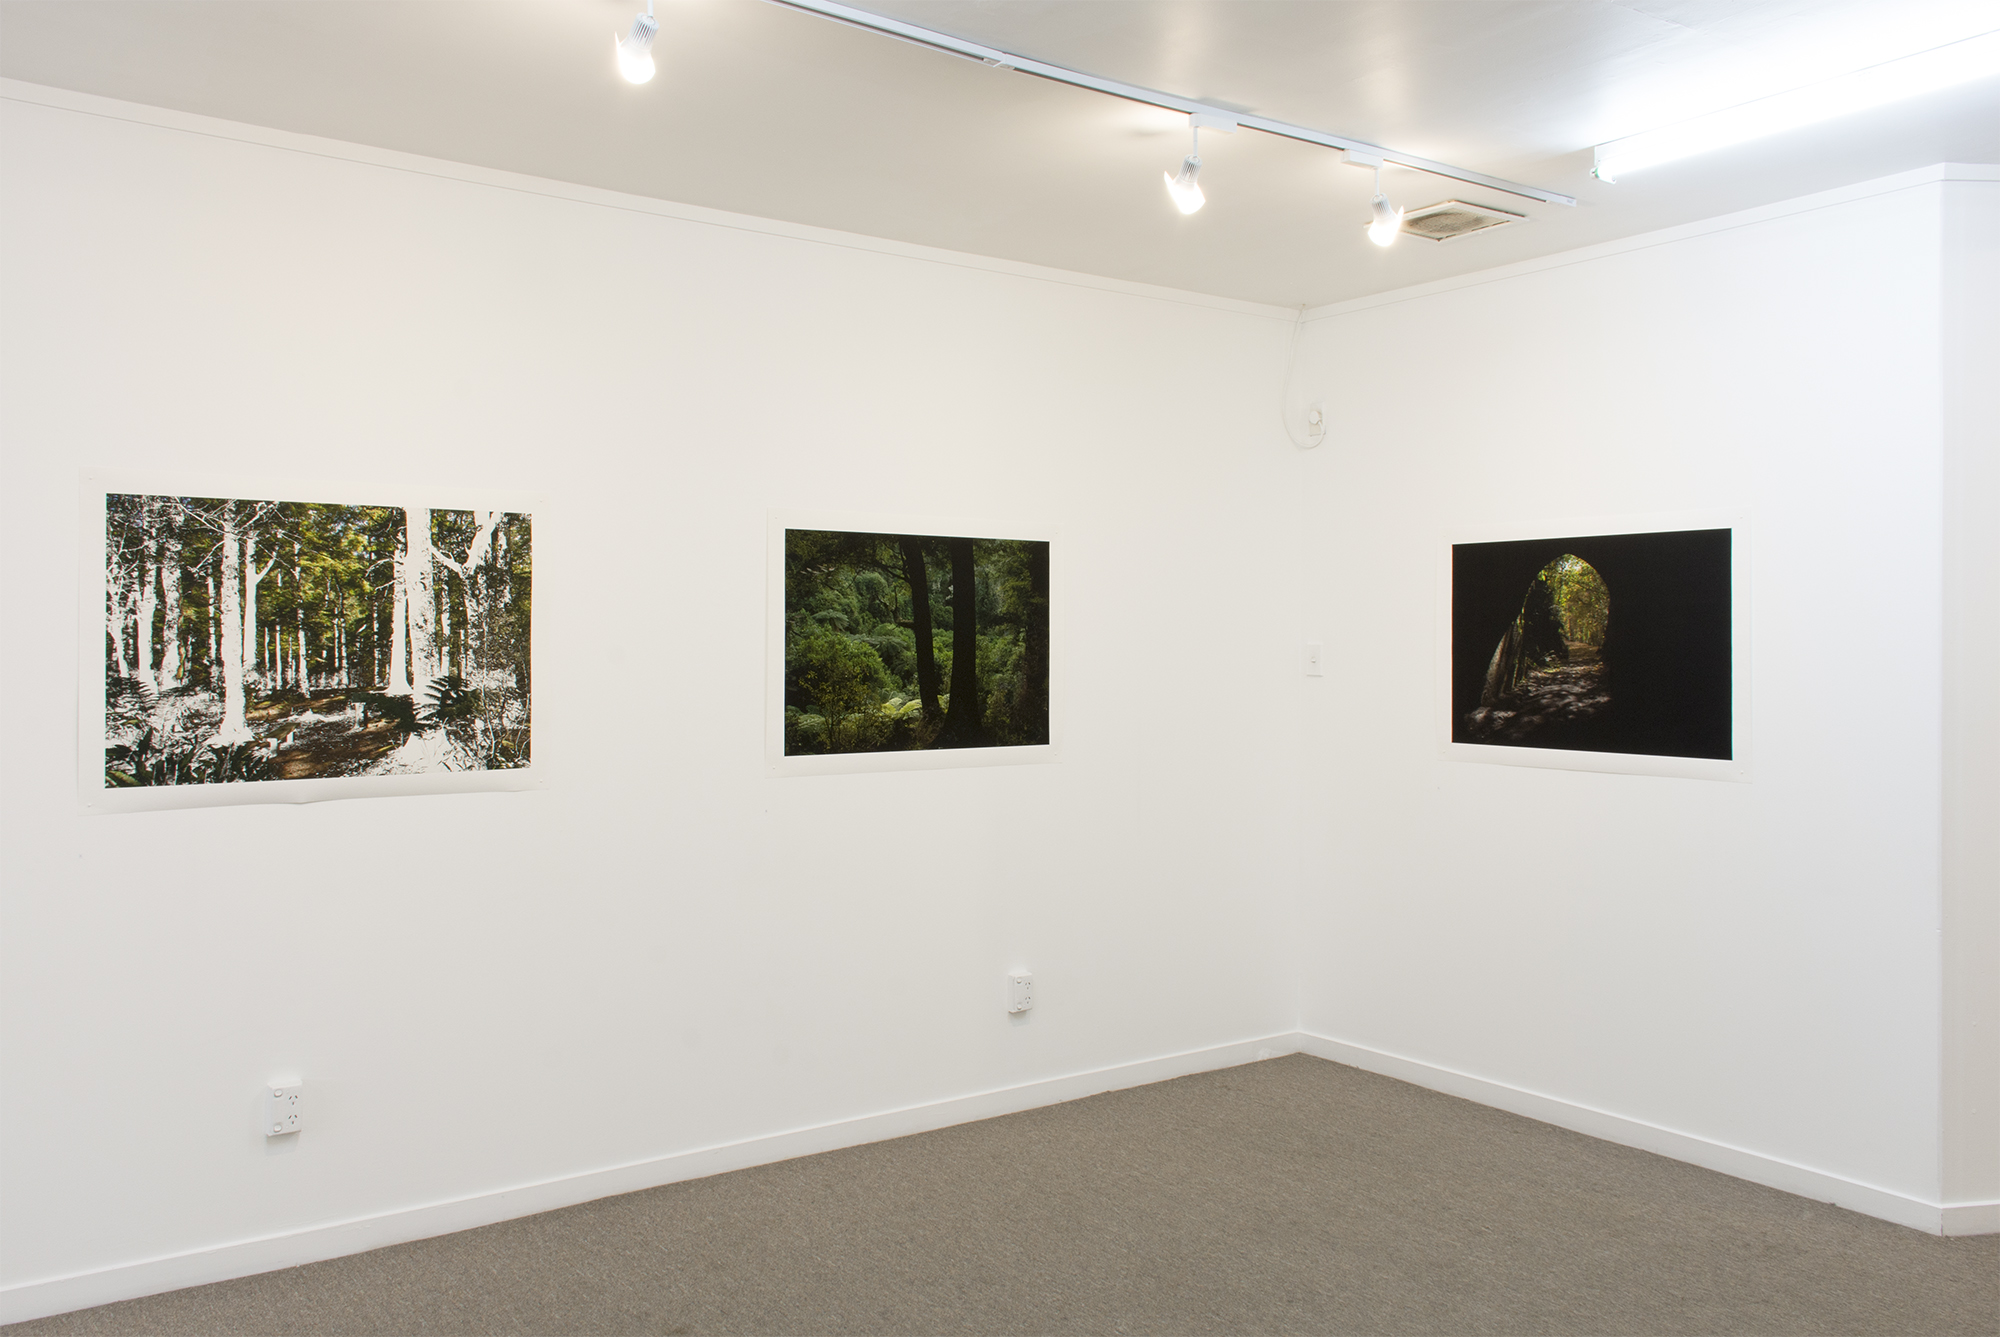 Photospace Gallery Wellington March/April 2017 #2